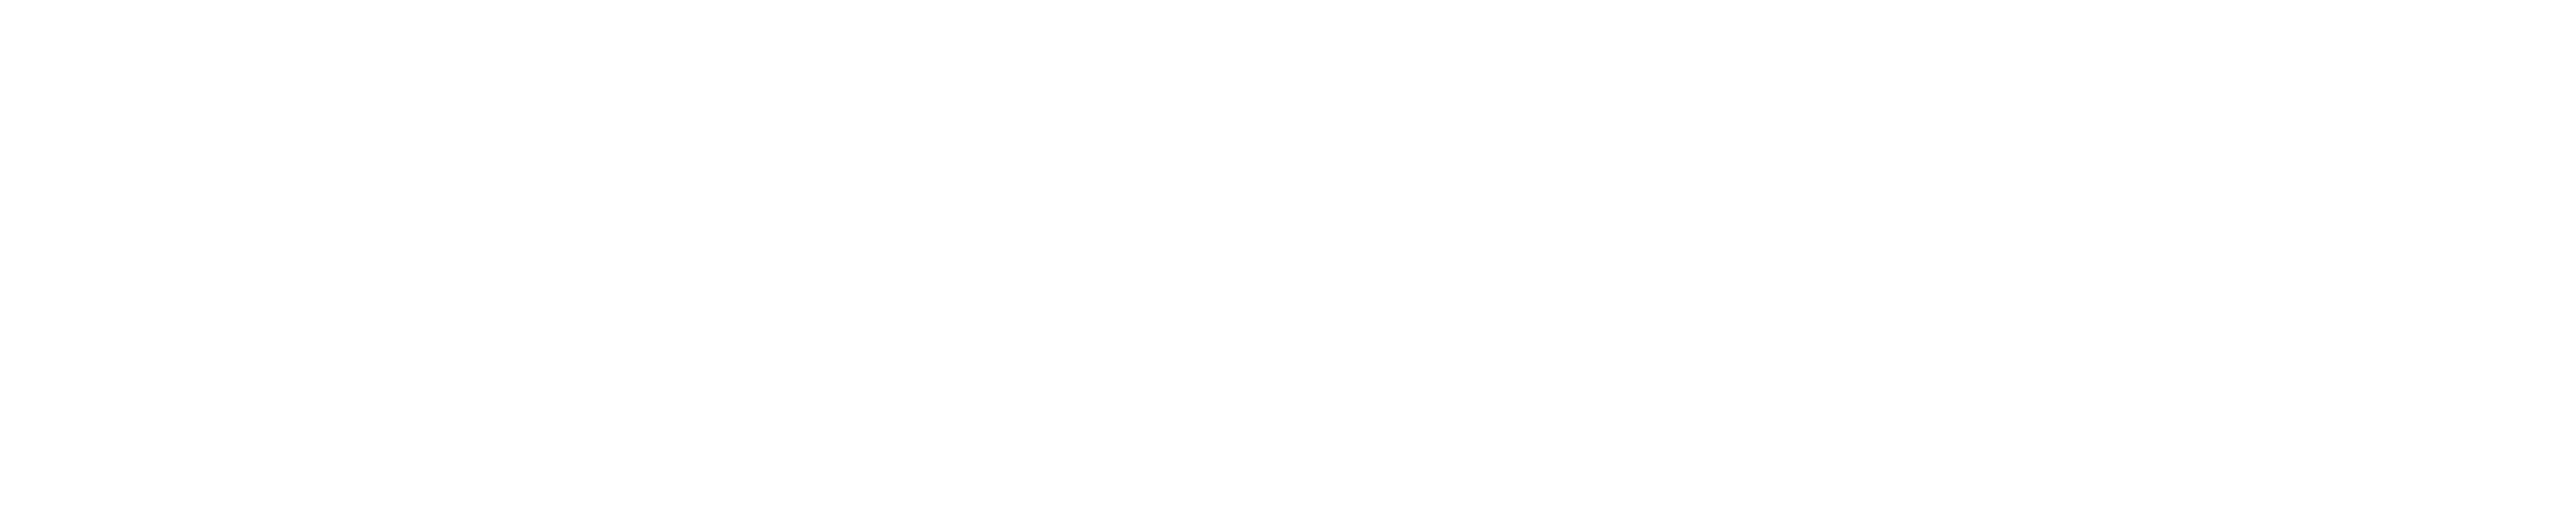 Archiplus - Footer logo blanc